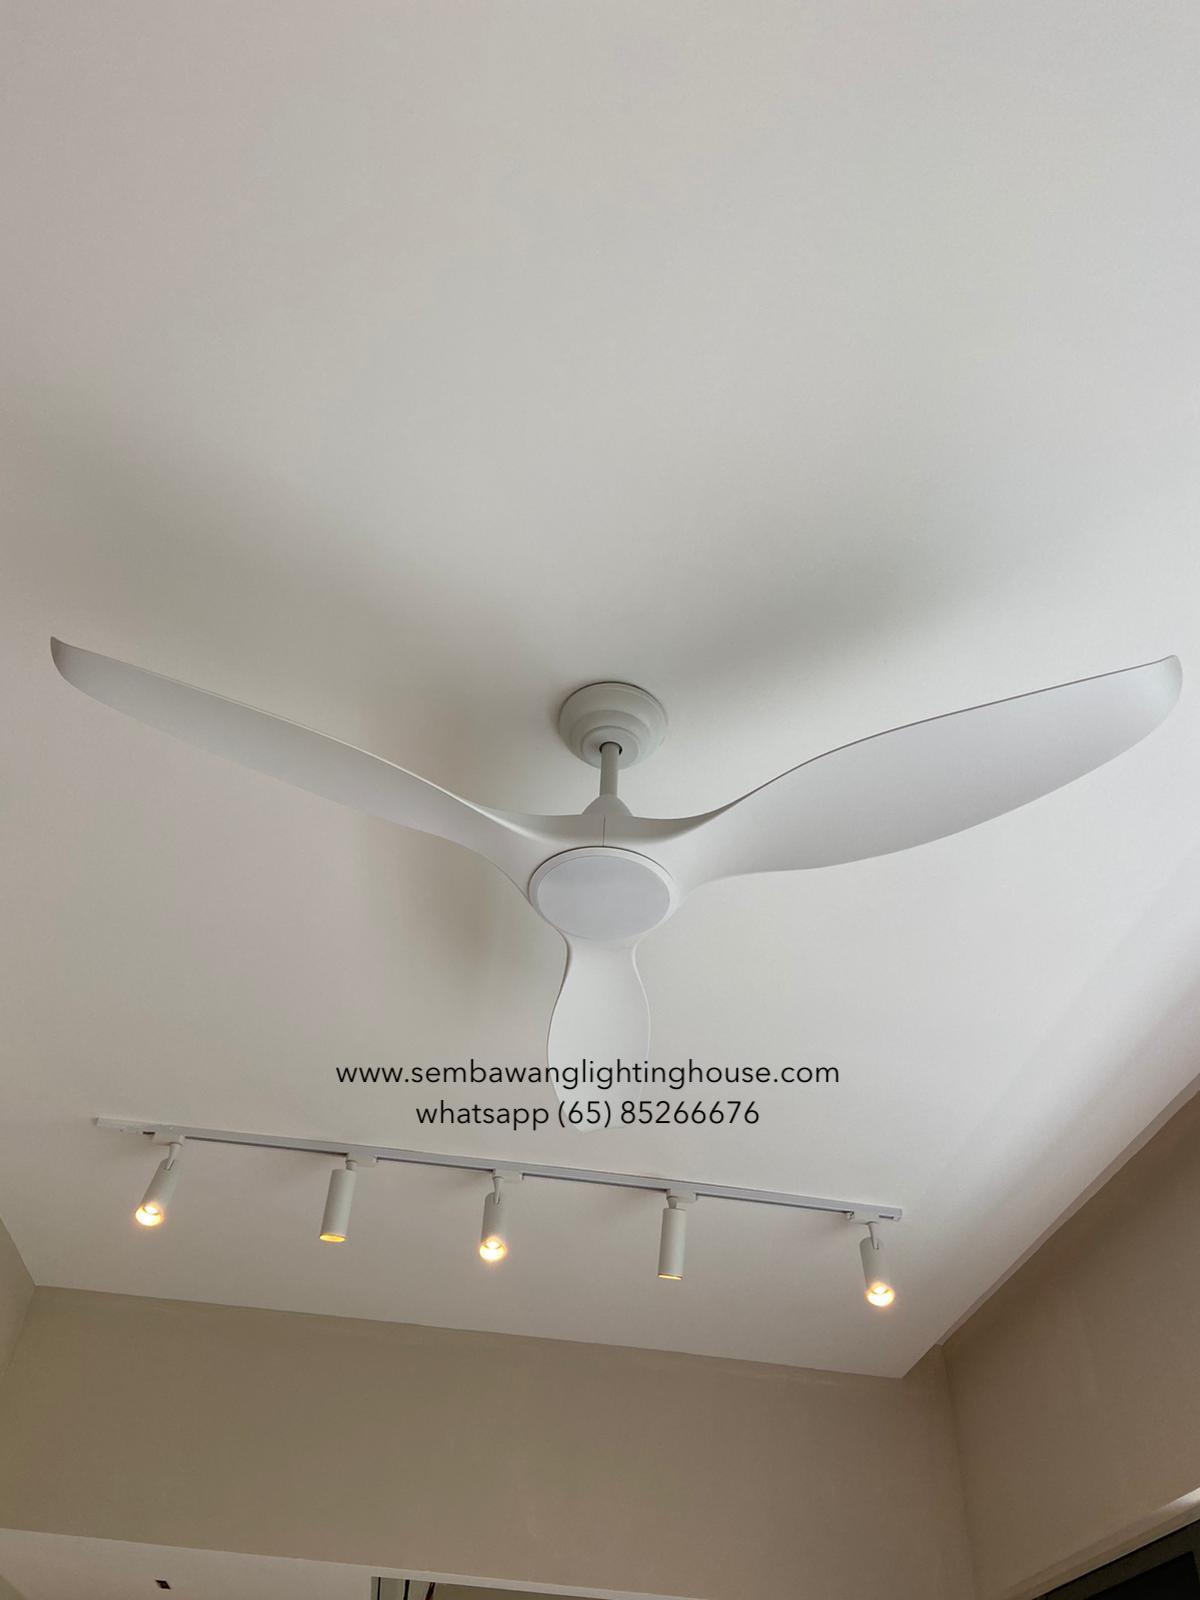 efenz-rod-ceiling-fan-with-light-white-sembawang-lighting-house-07.jpeg